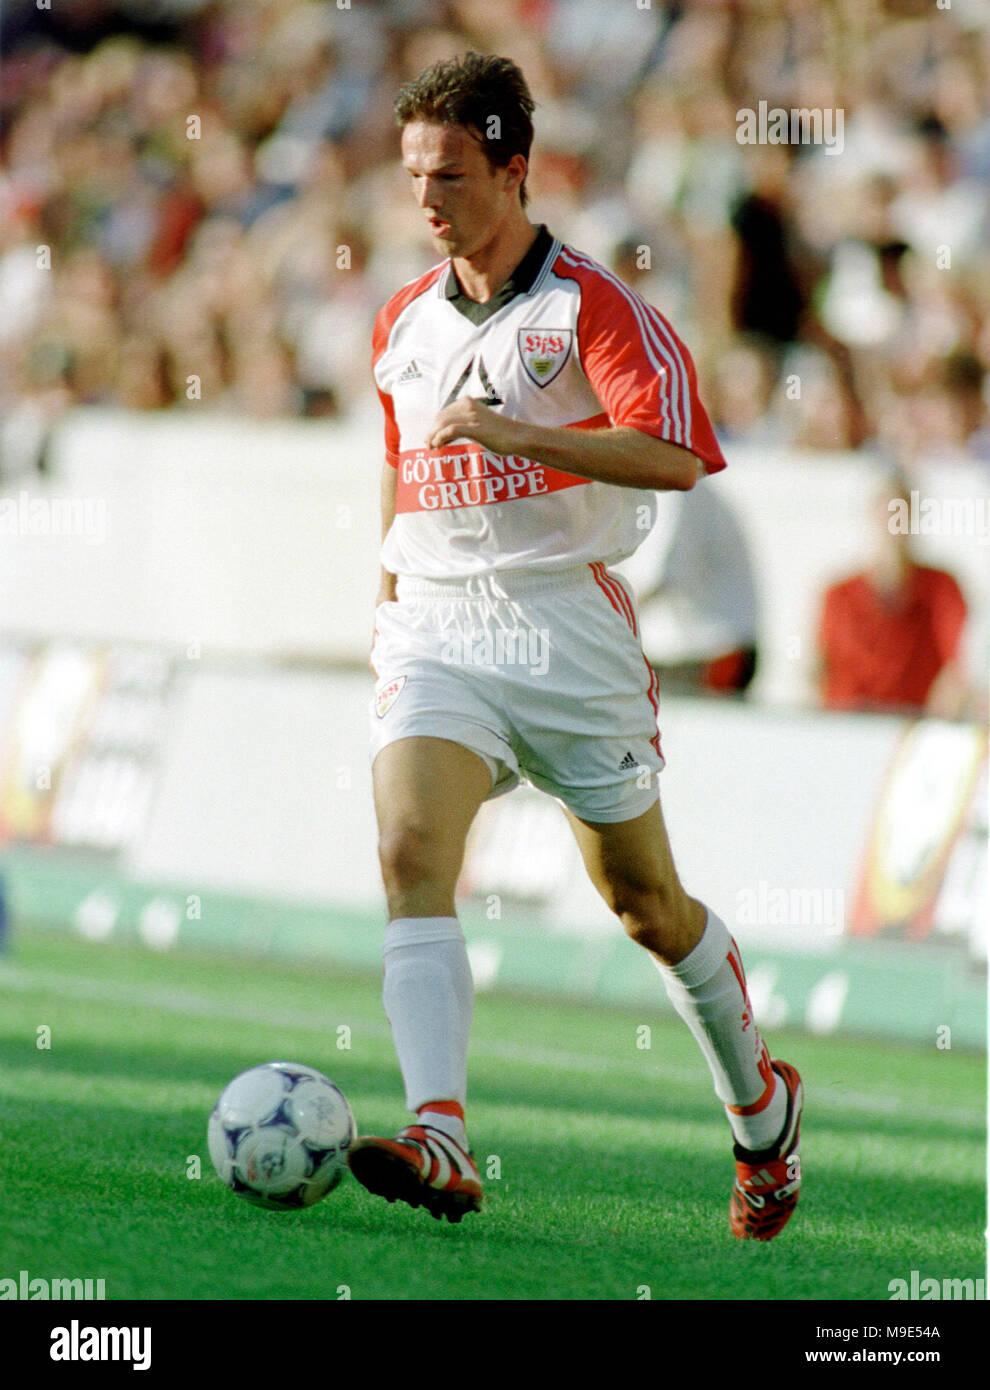 BayArena Leverkusen, Germany, 8.8.1998, German Liga-Cup Final, FC Bayern Munich vs VfB Stuttgart ---  Fredi BOBIC  (Stuttgart) - Stock Image